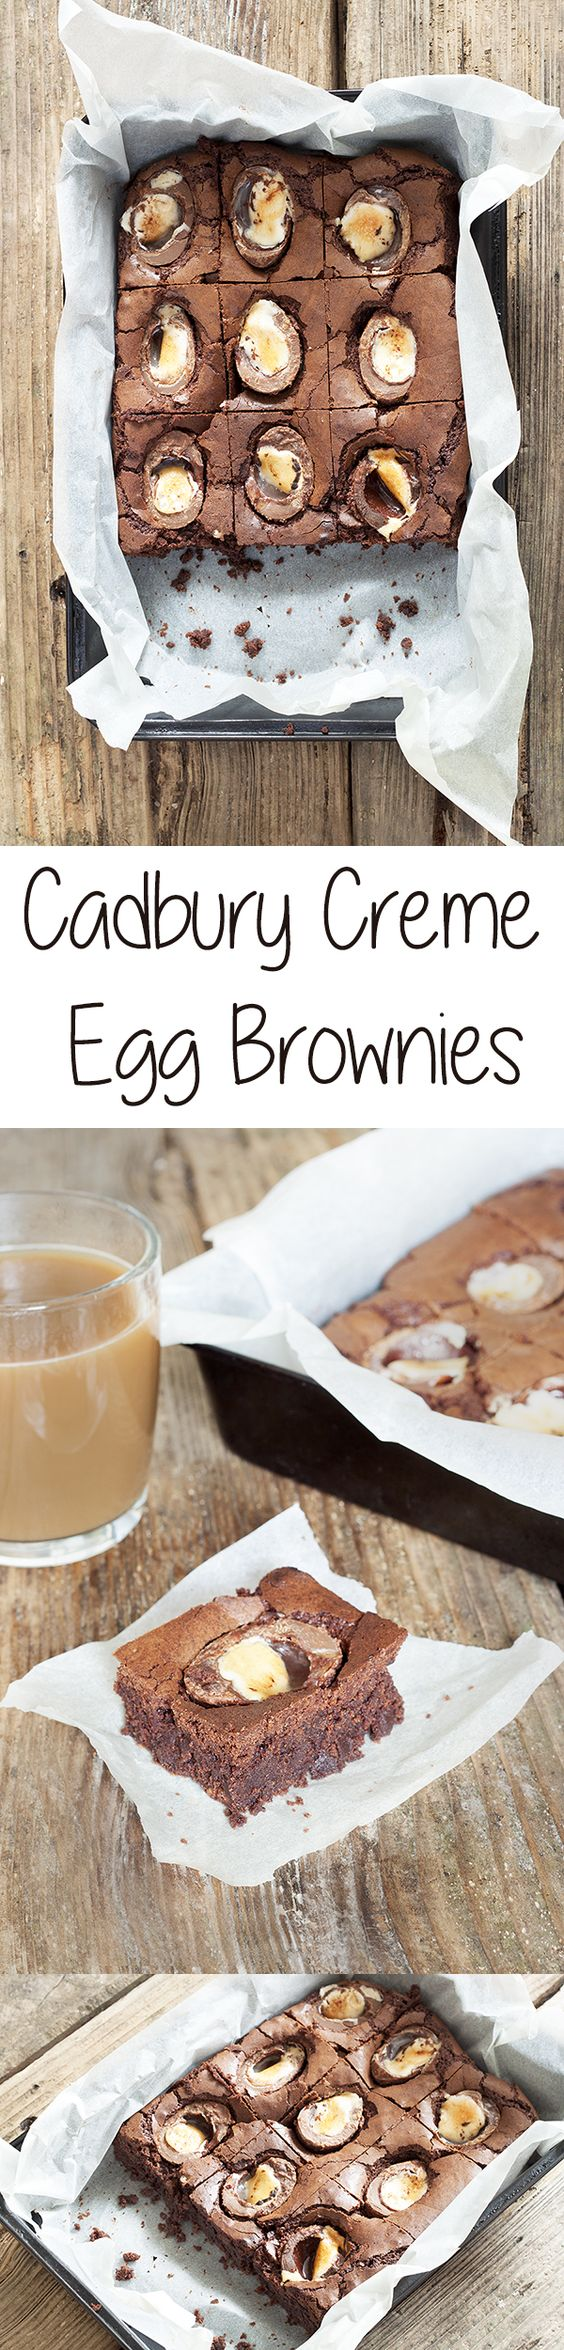 Cadbury Creme Egg Brownies Scrumptious